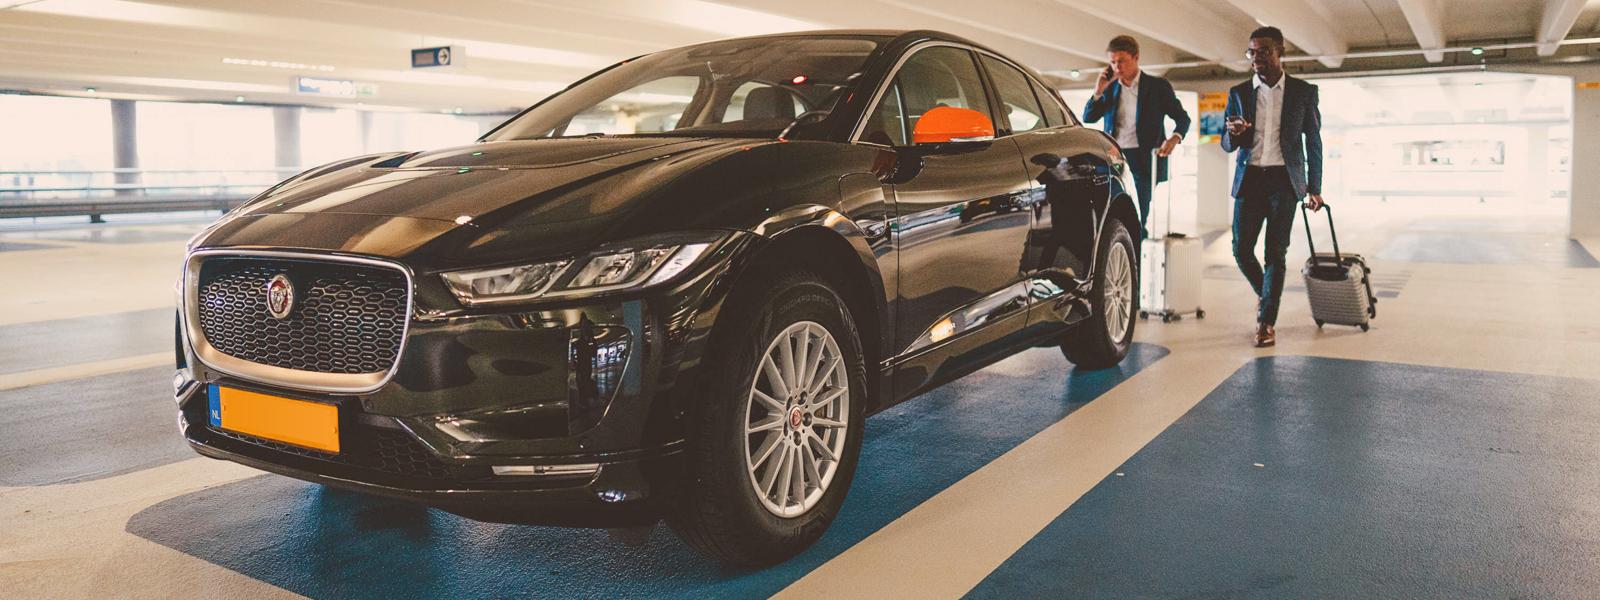 sixt share carsharing parkeerregels amsterdam jaguar